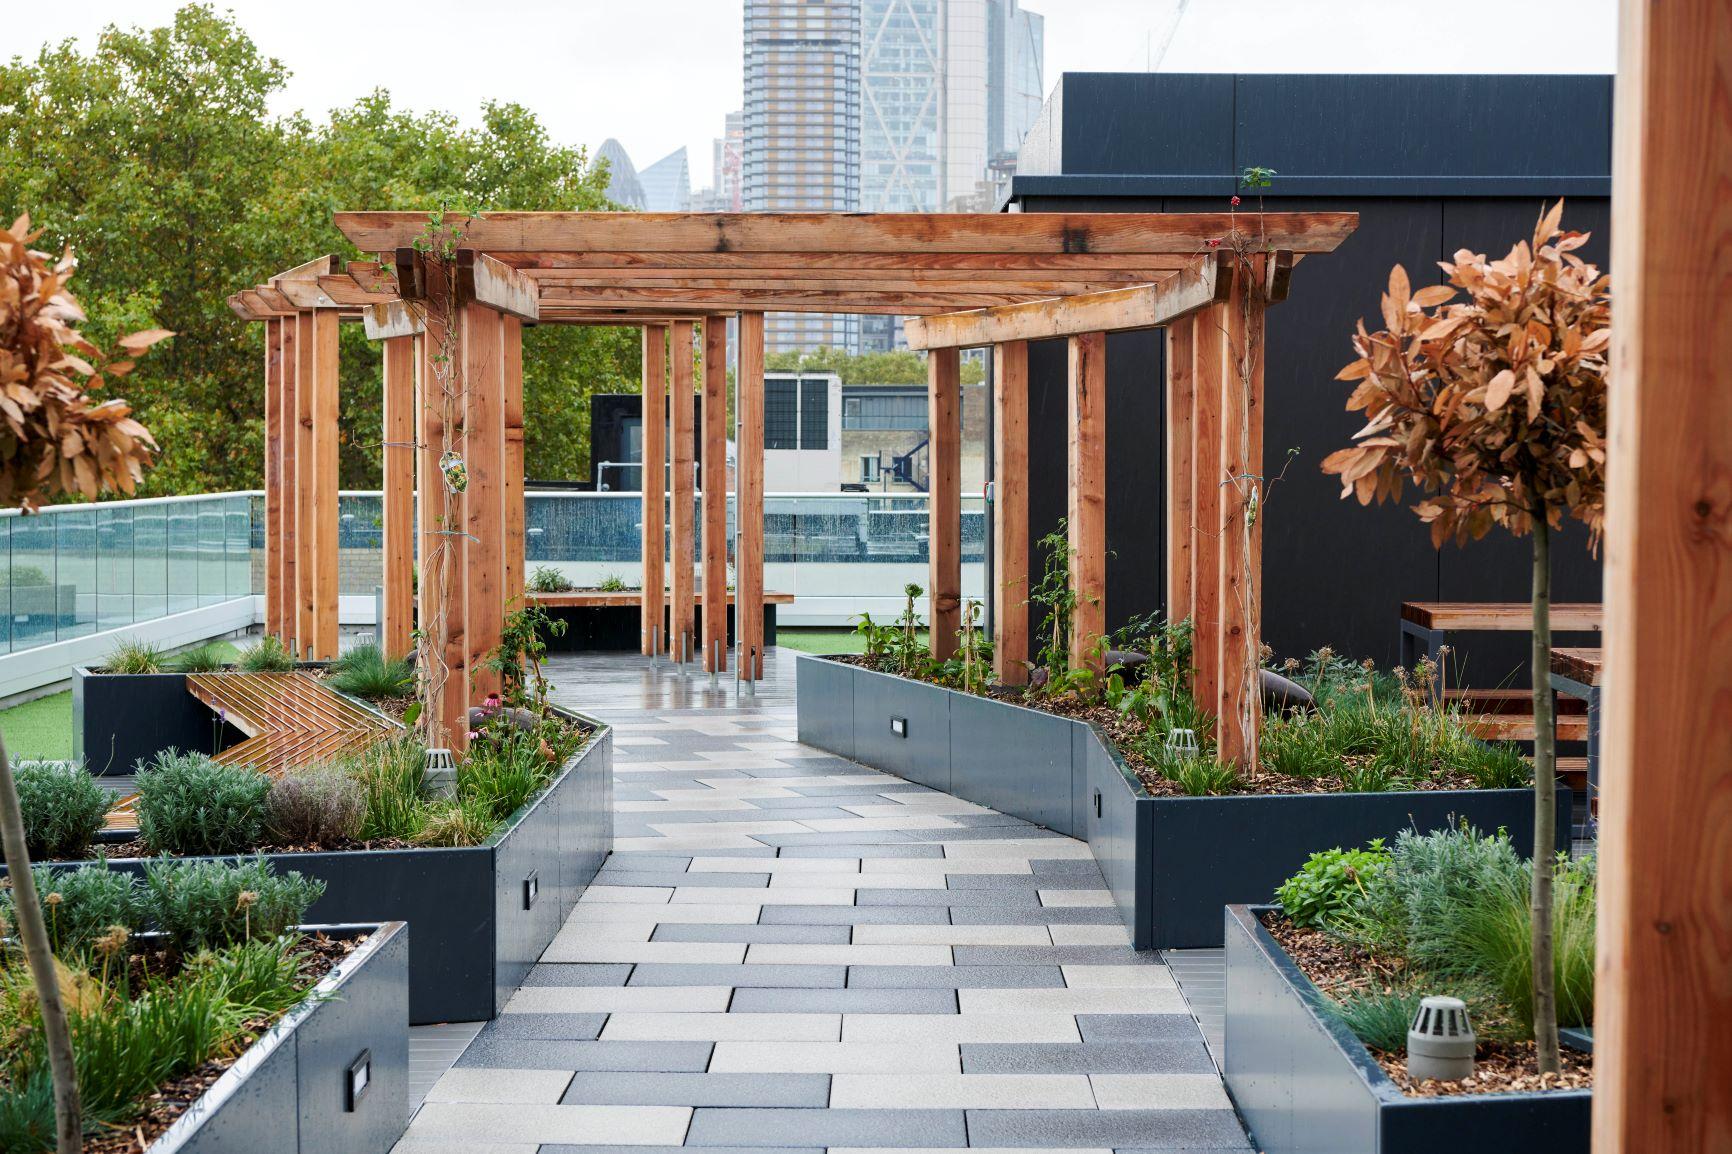 Urban greening for better health